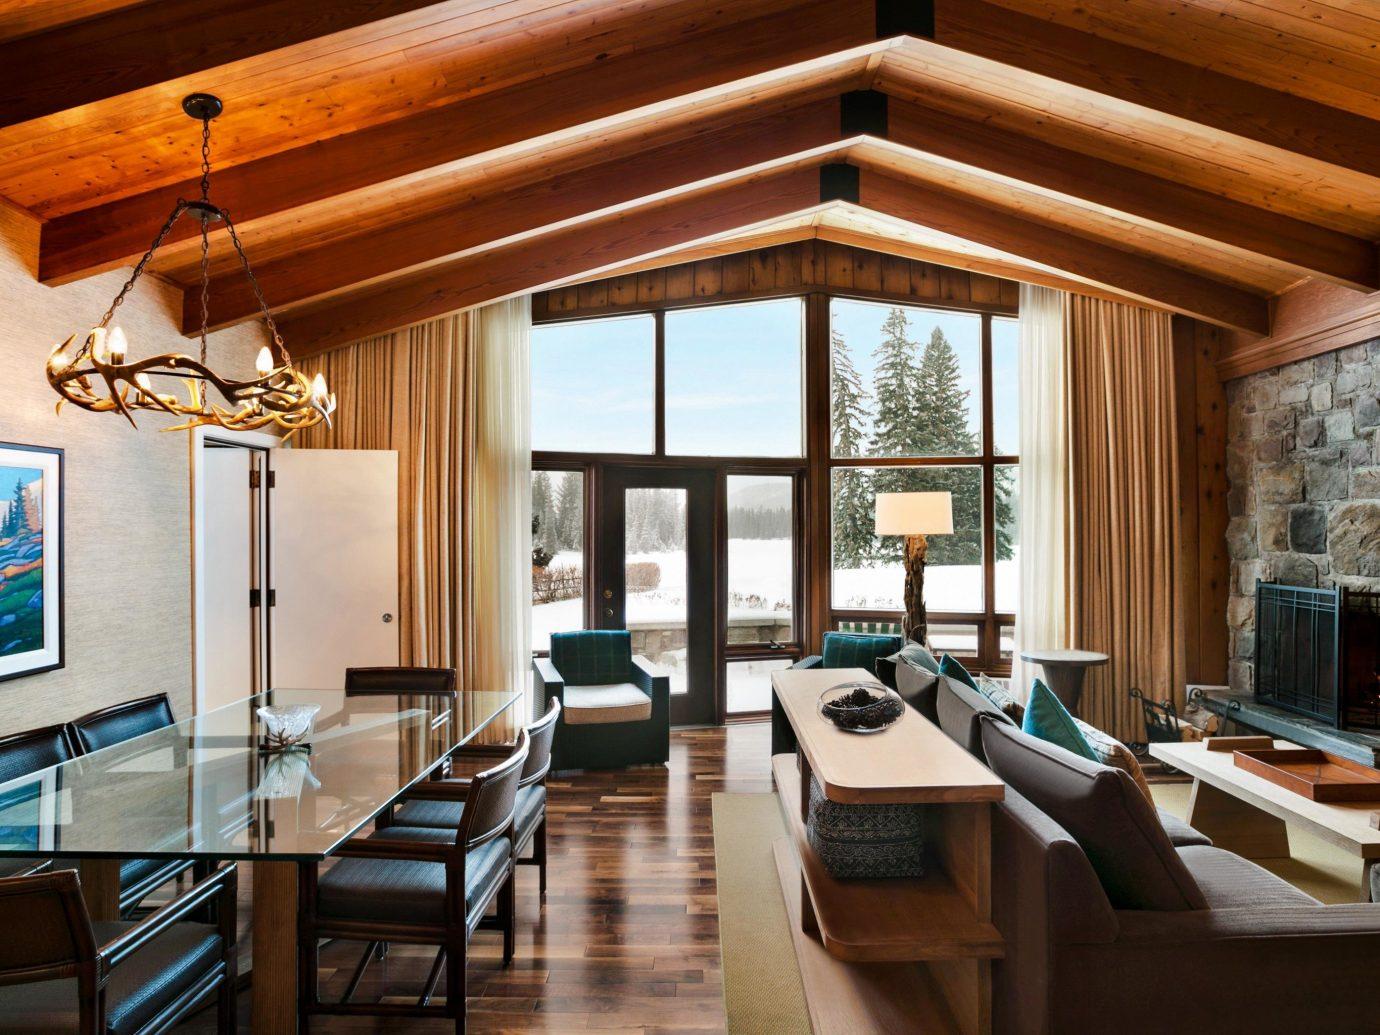 Alberta Canada Road Trips indoor Living table room floor window furniture living room interior design ceiling Fireplace wood real estate dining room Suite penthouse apartment interior designer daylighting area